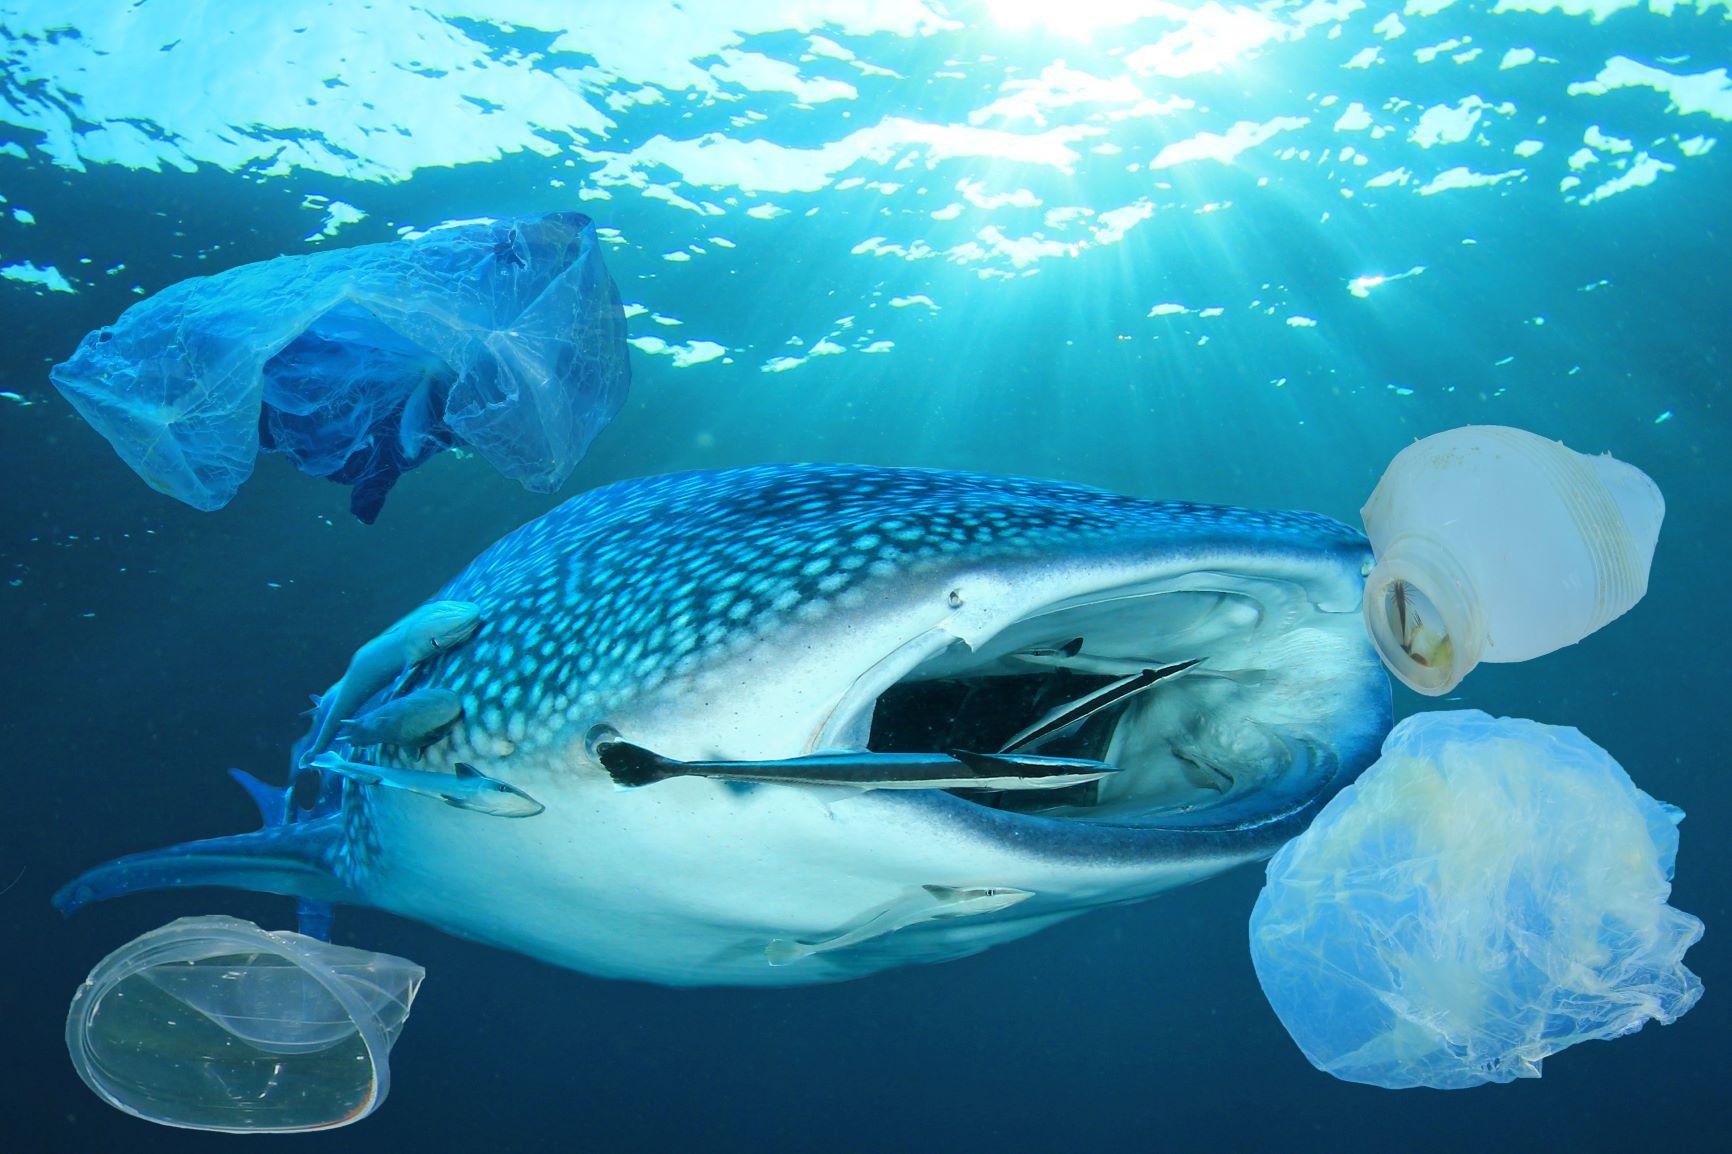 rantai-makanan-di-laut